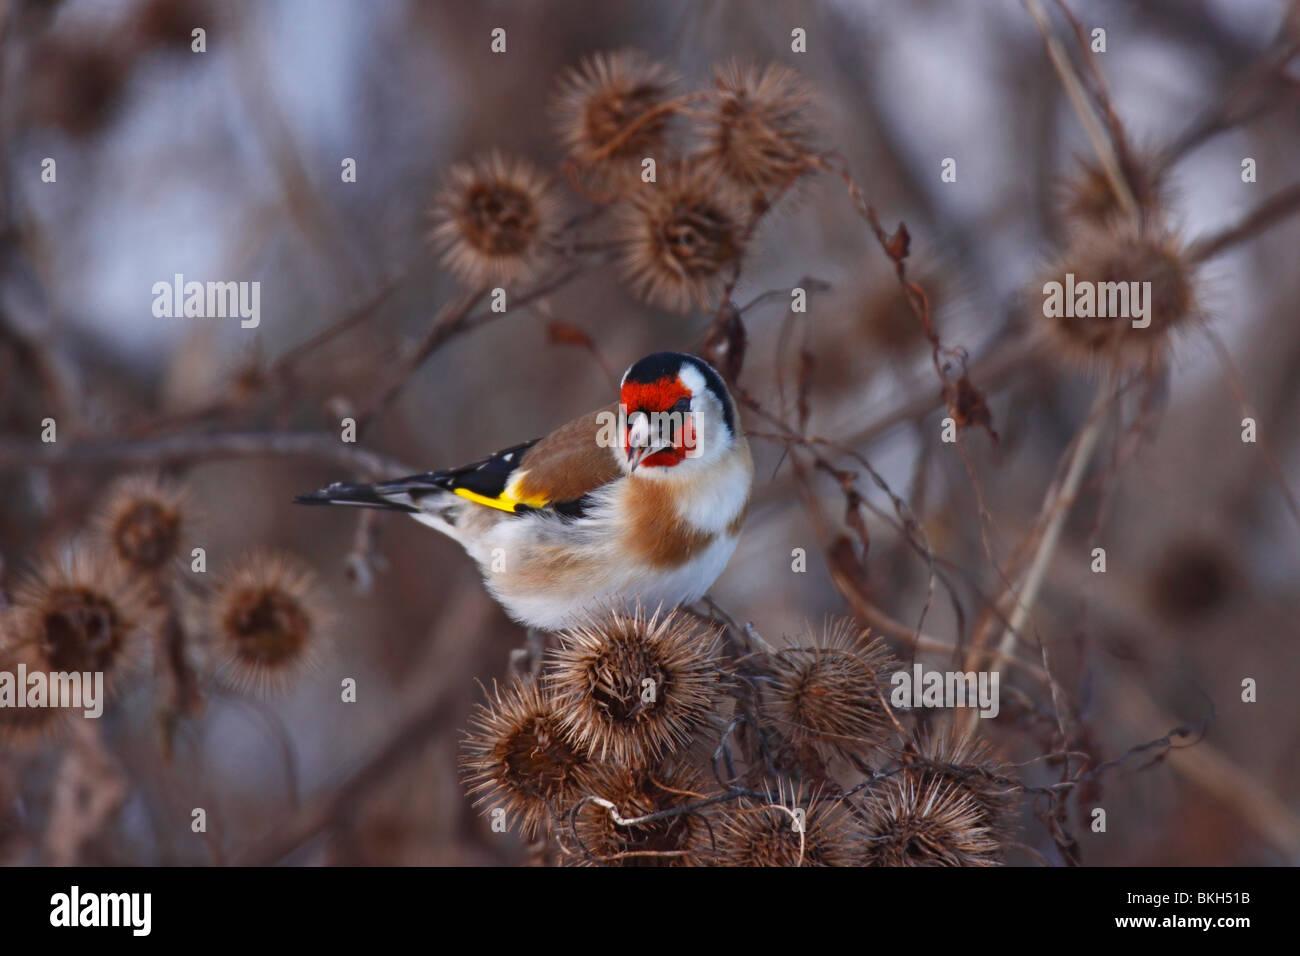 Stieglitz, Carduelis, Distelfink, goldfinch, Stock Photo